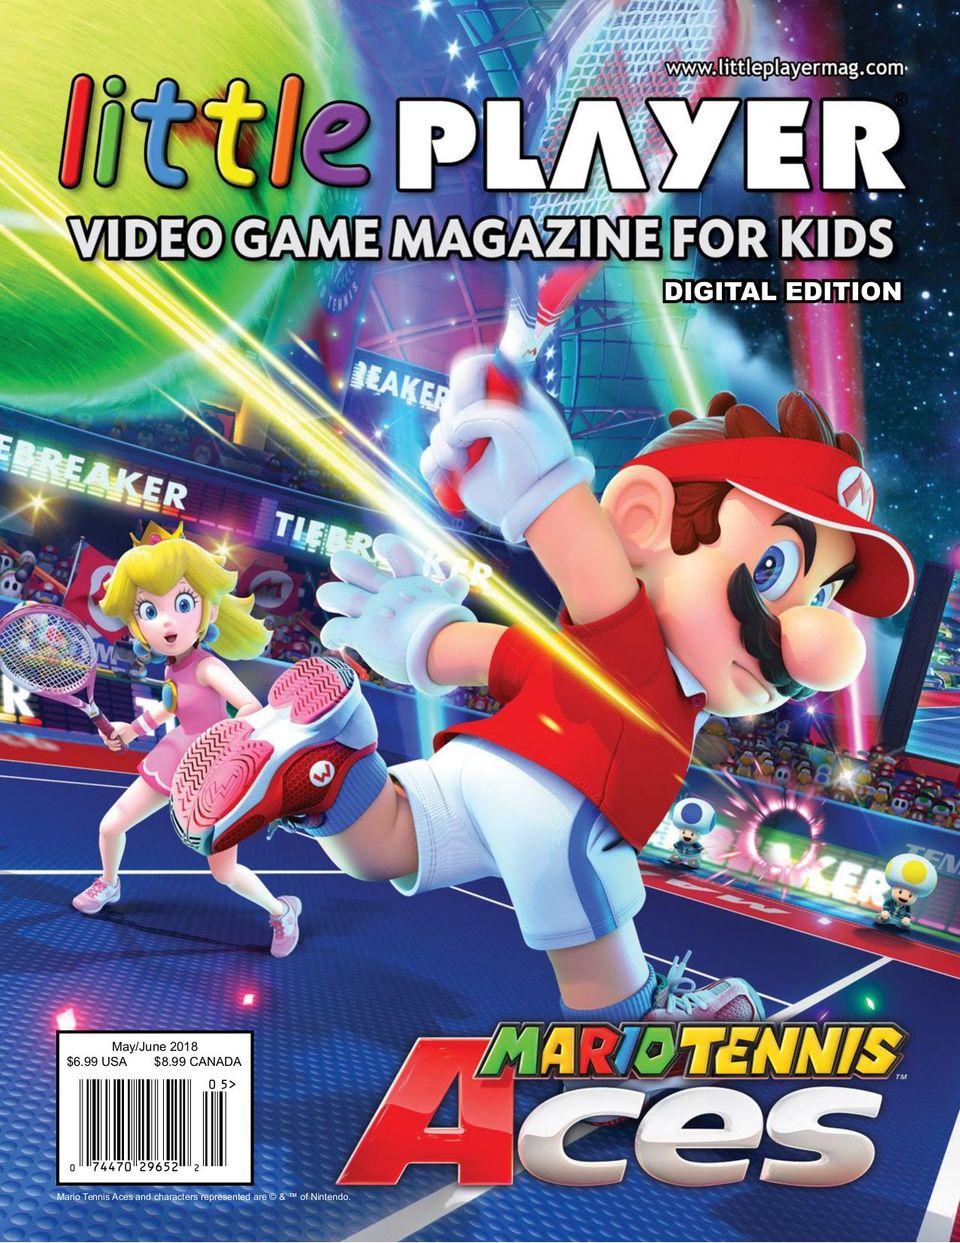 Little Player Video Game Magazine For Kids Magazine